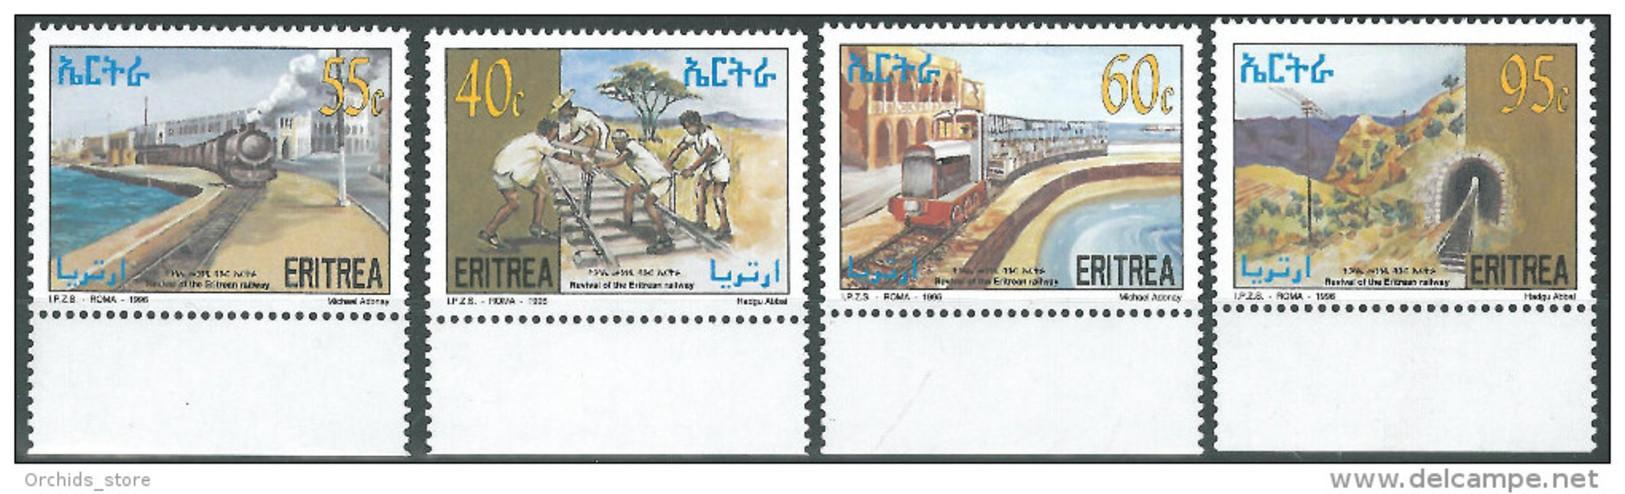 ERITREA Erythrée 1996 MNH ** Revival Of The Eritrean Railway - Train - ITALY - Eritrea